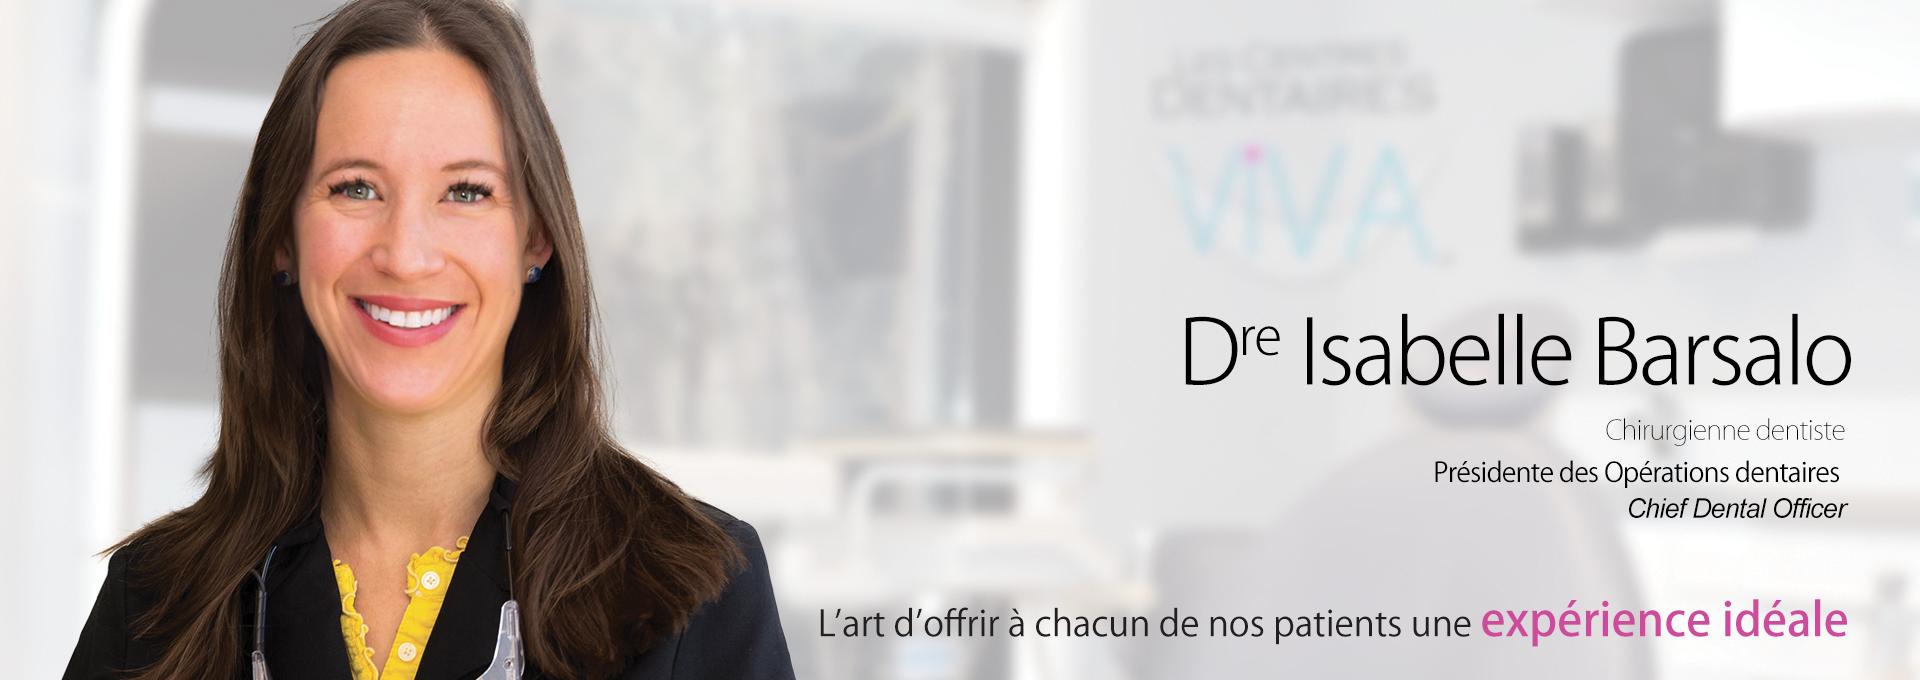 web-bandeau-Dre-Isabelle-Barsalo-2021